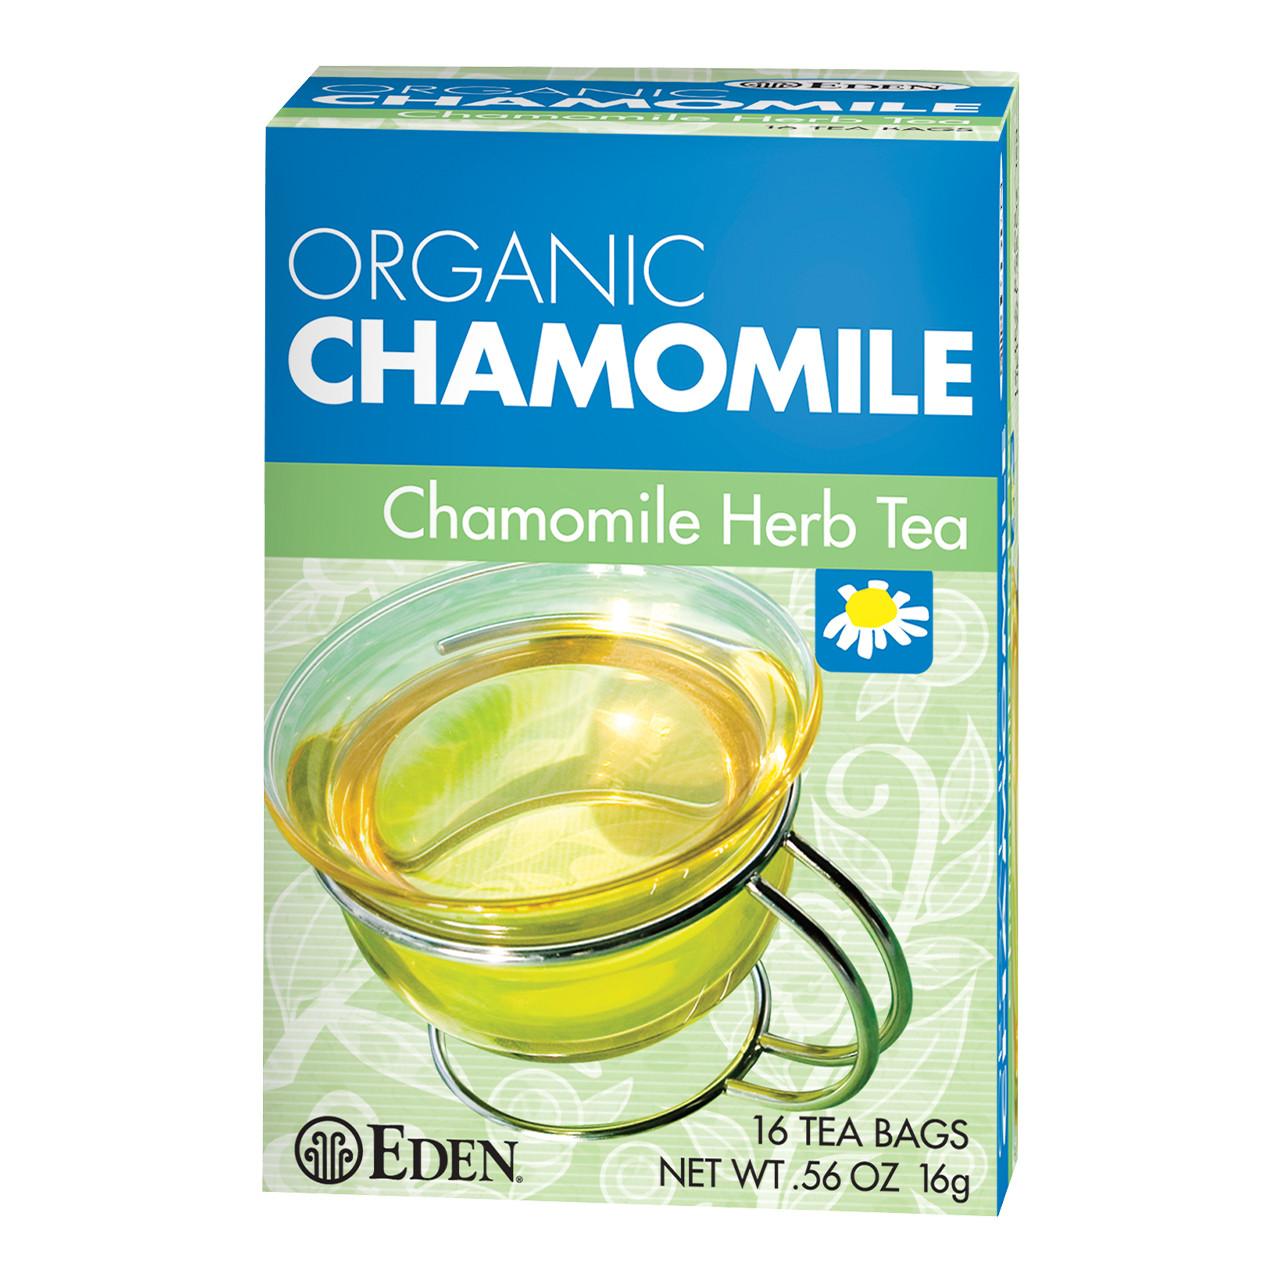 Chamomile Herb Tea, Organic